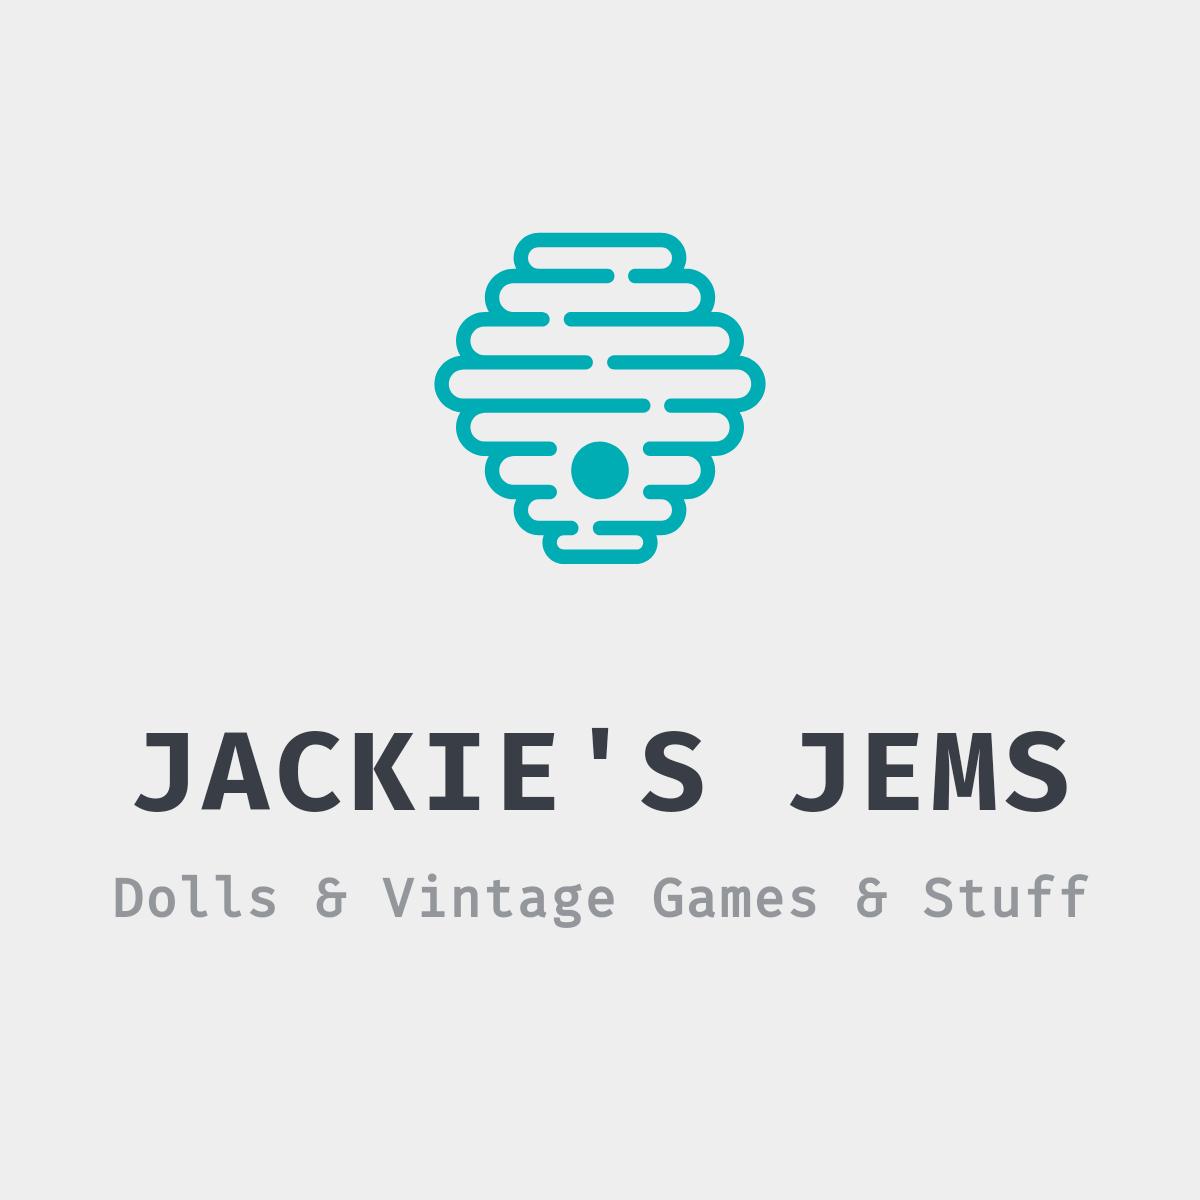 Jackie's Jems